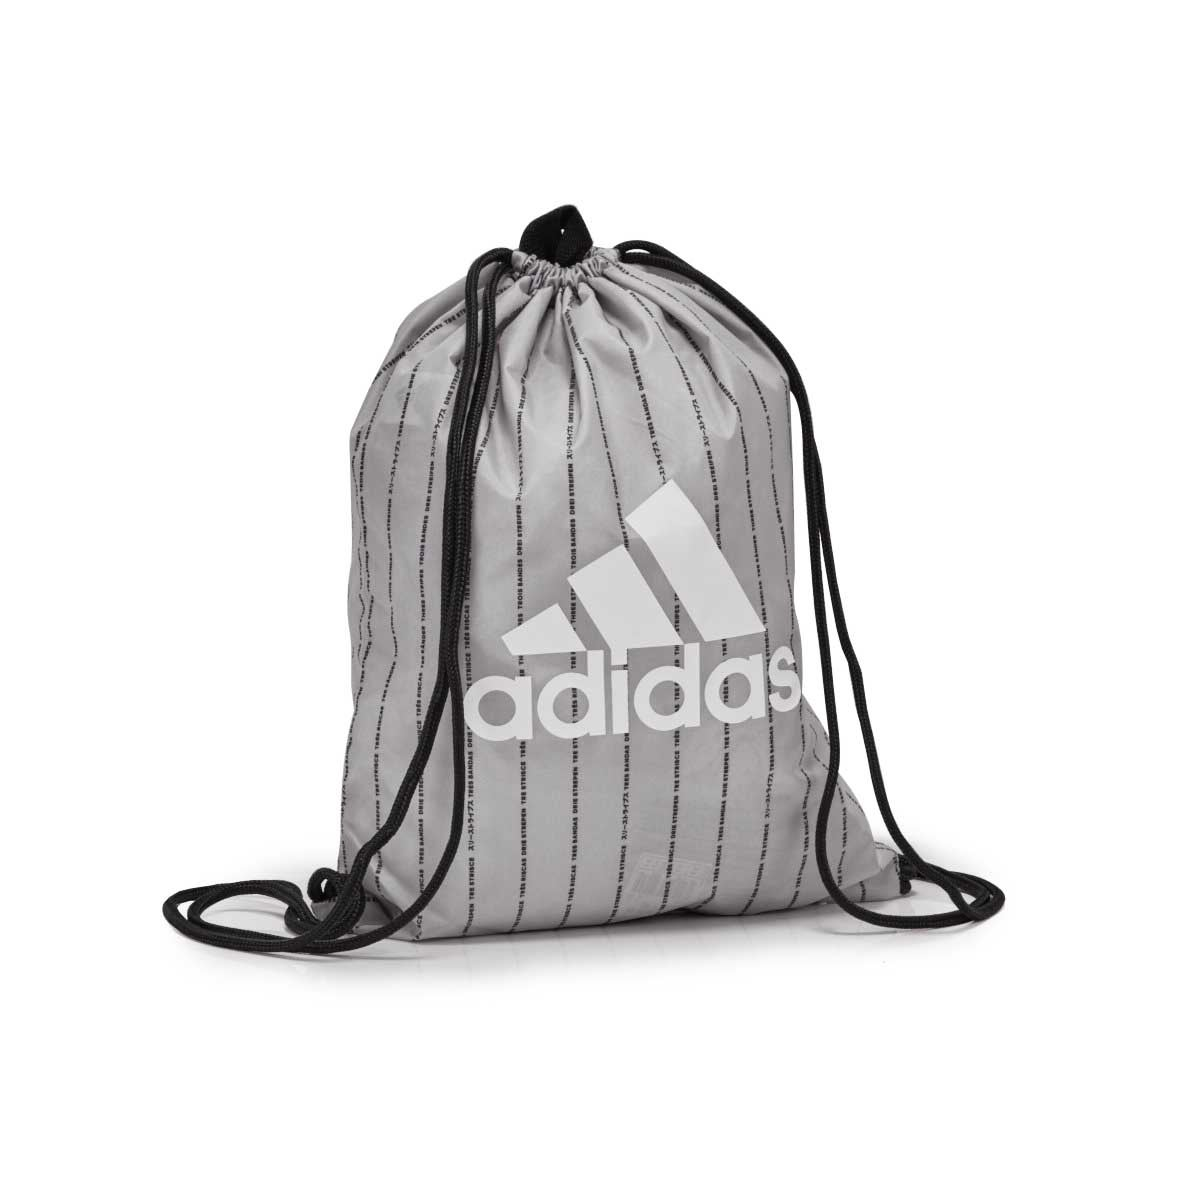 Adidas Classic Core GB gry/bk/wt sackpac